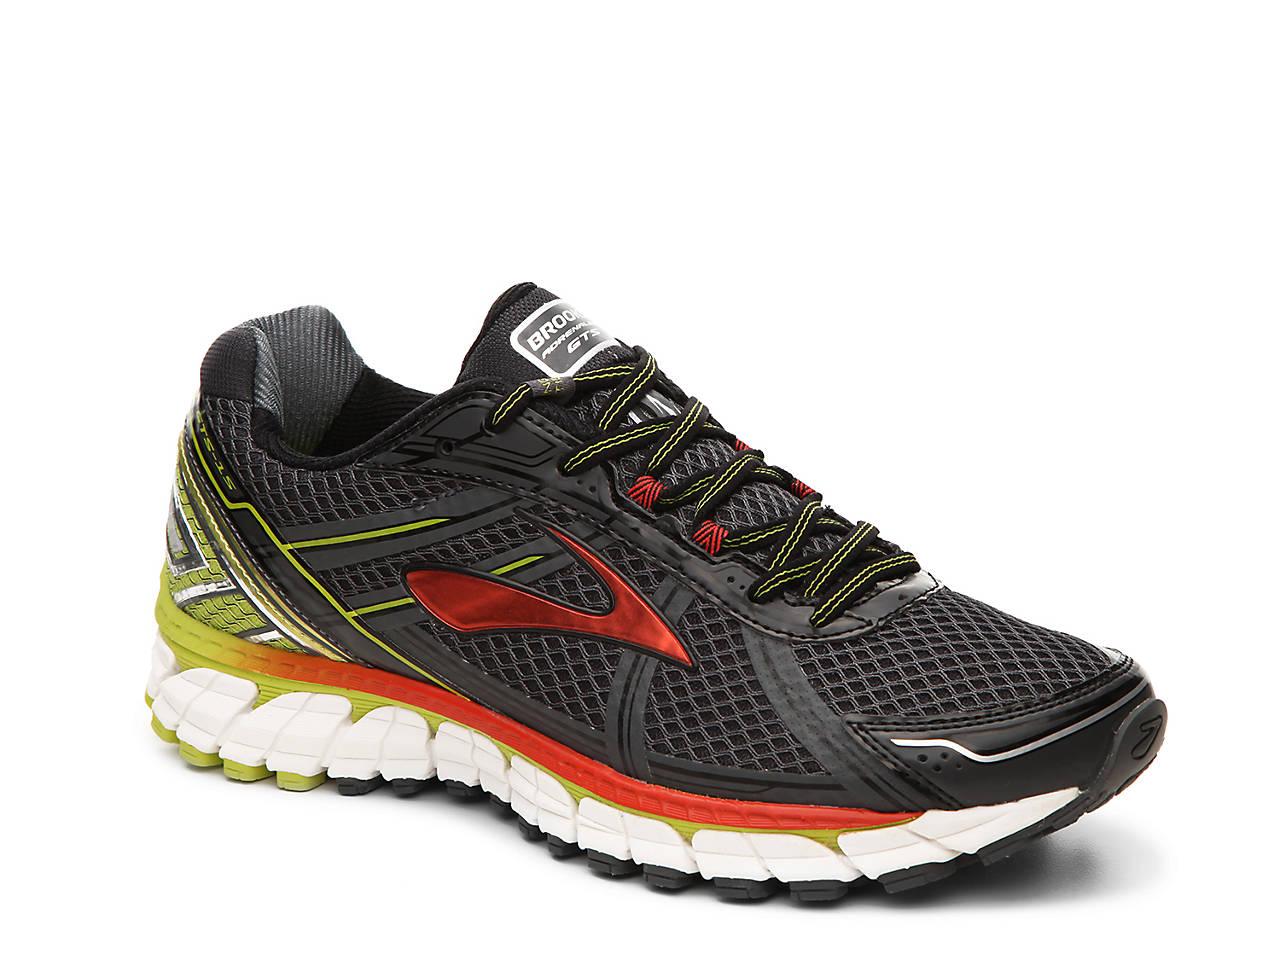 74306b5b38563 Brooks Adrenaline GTS 15 Performance Running Shoe - Men s Men s ...